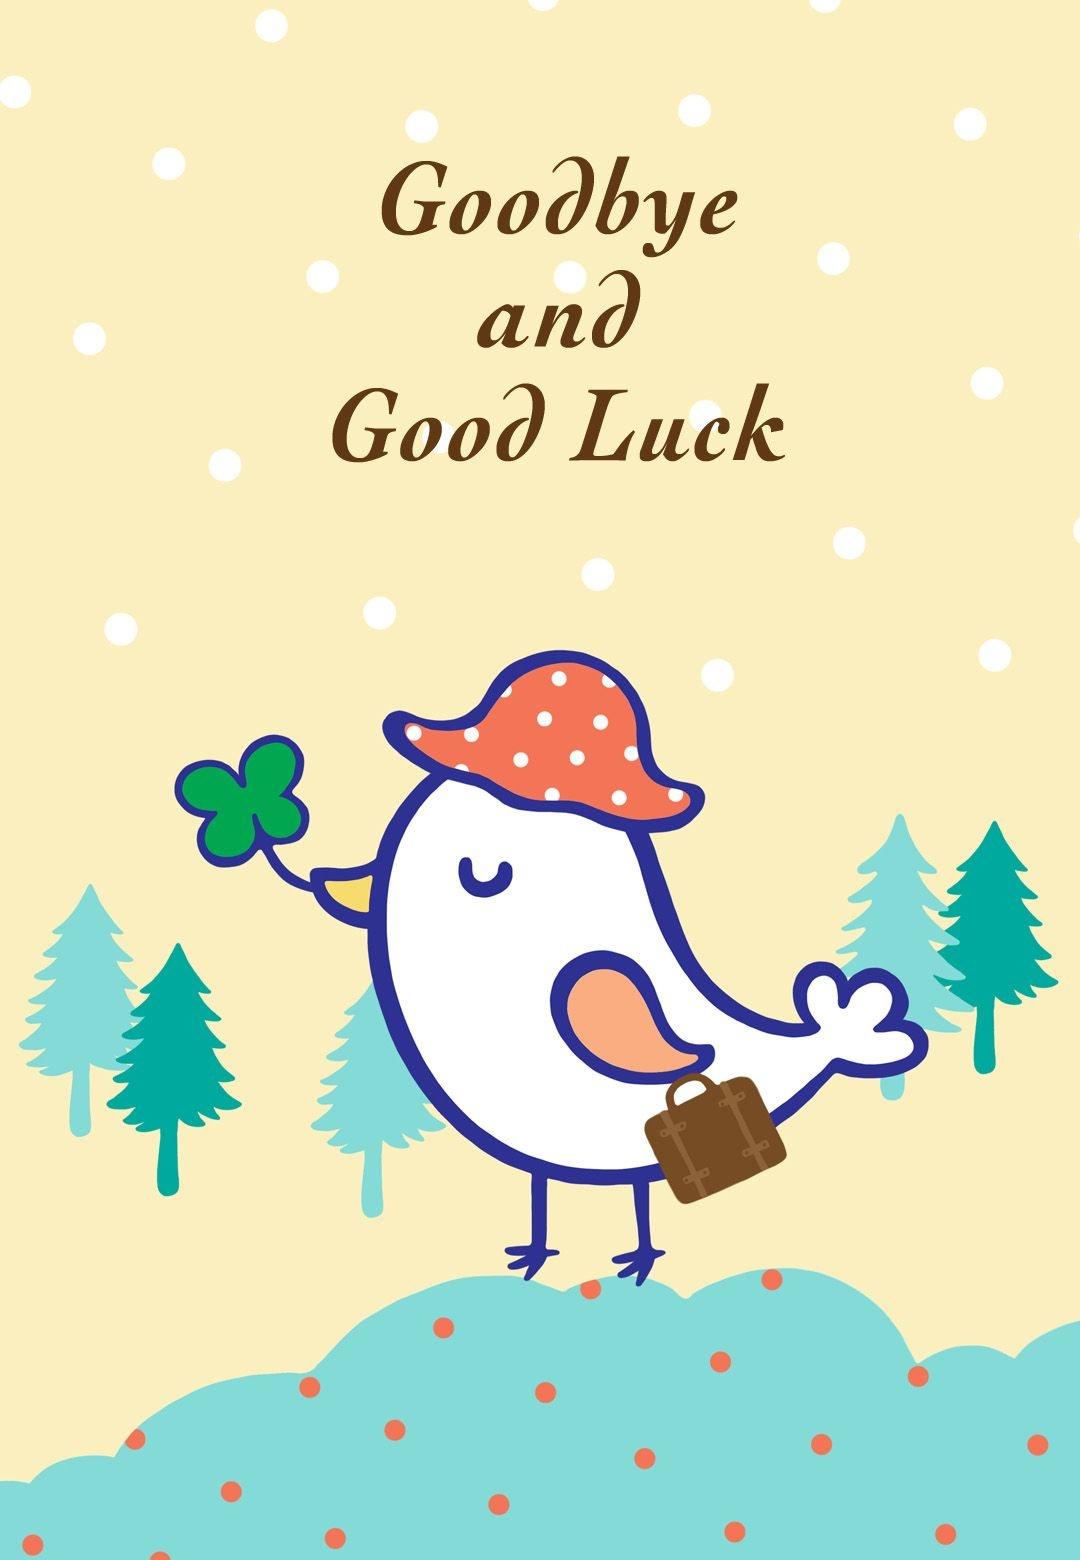 Free Printable Goodbye And Good Luck Greeting Card | Littlestar - Free Printable Apology Cards